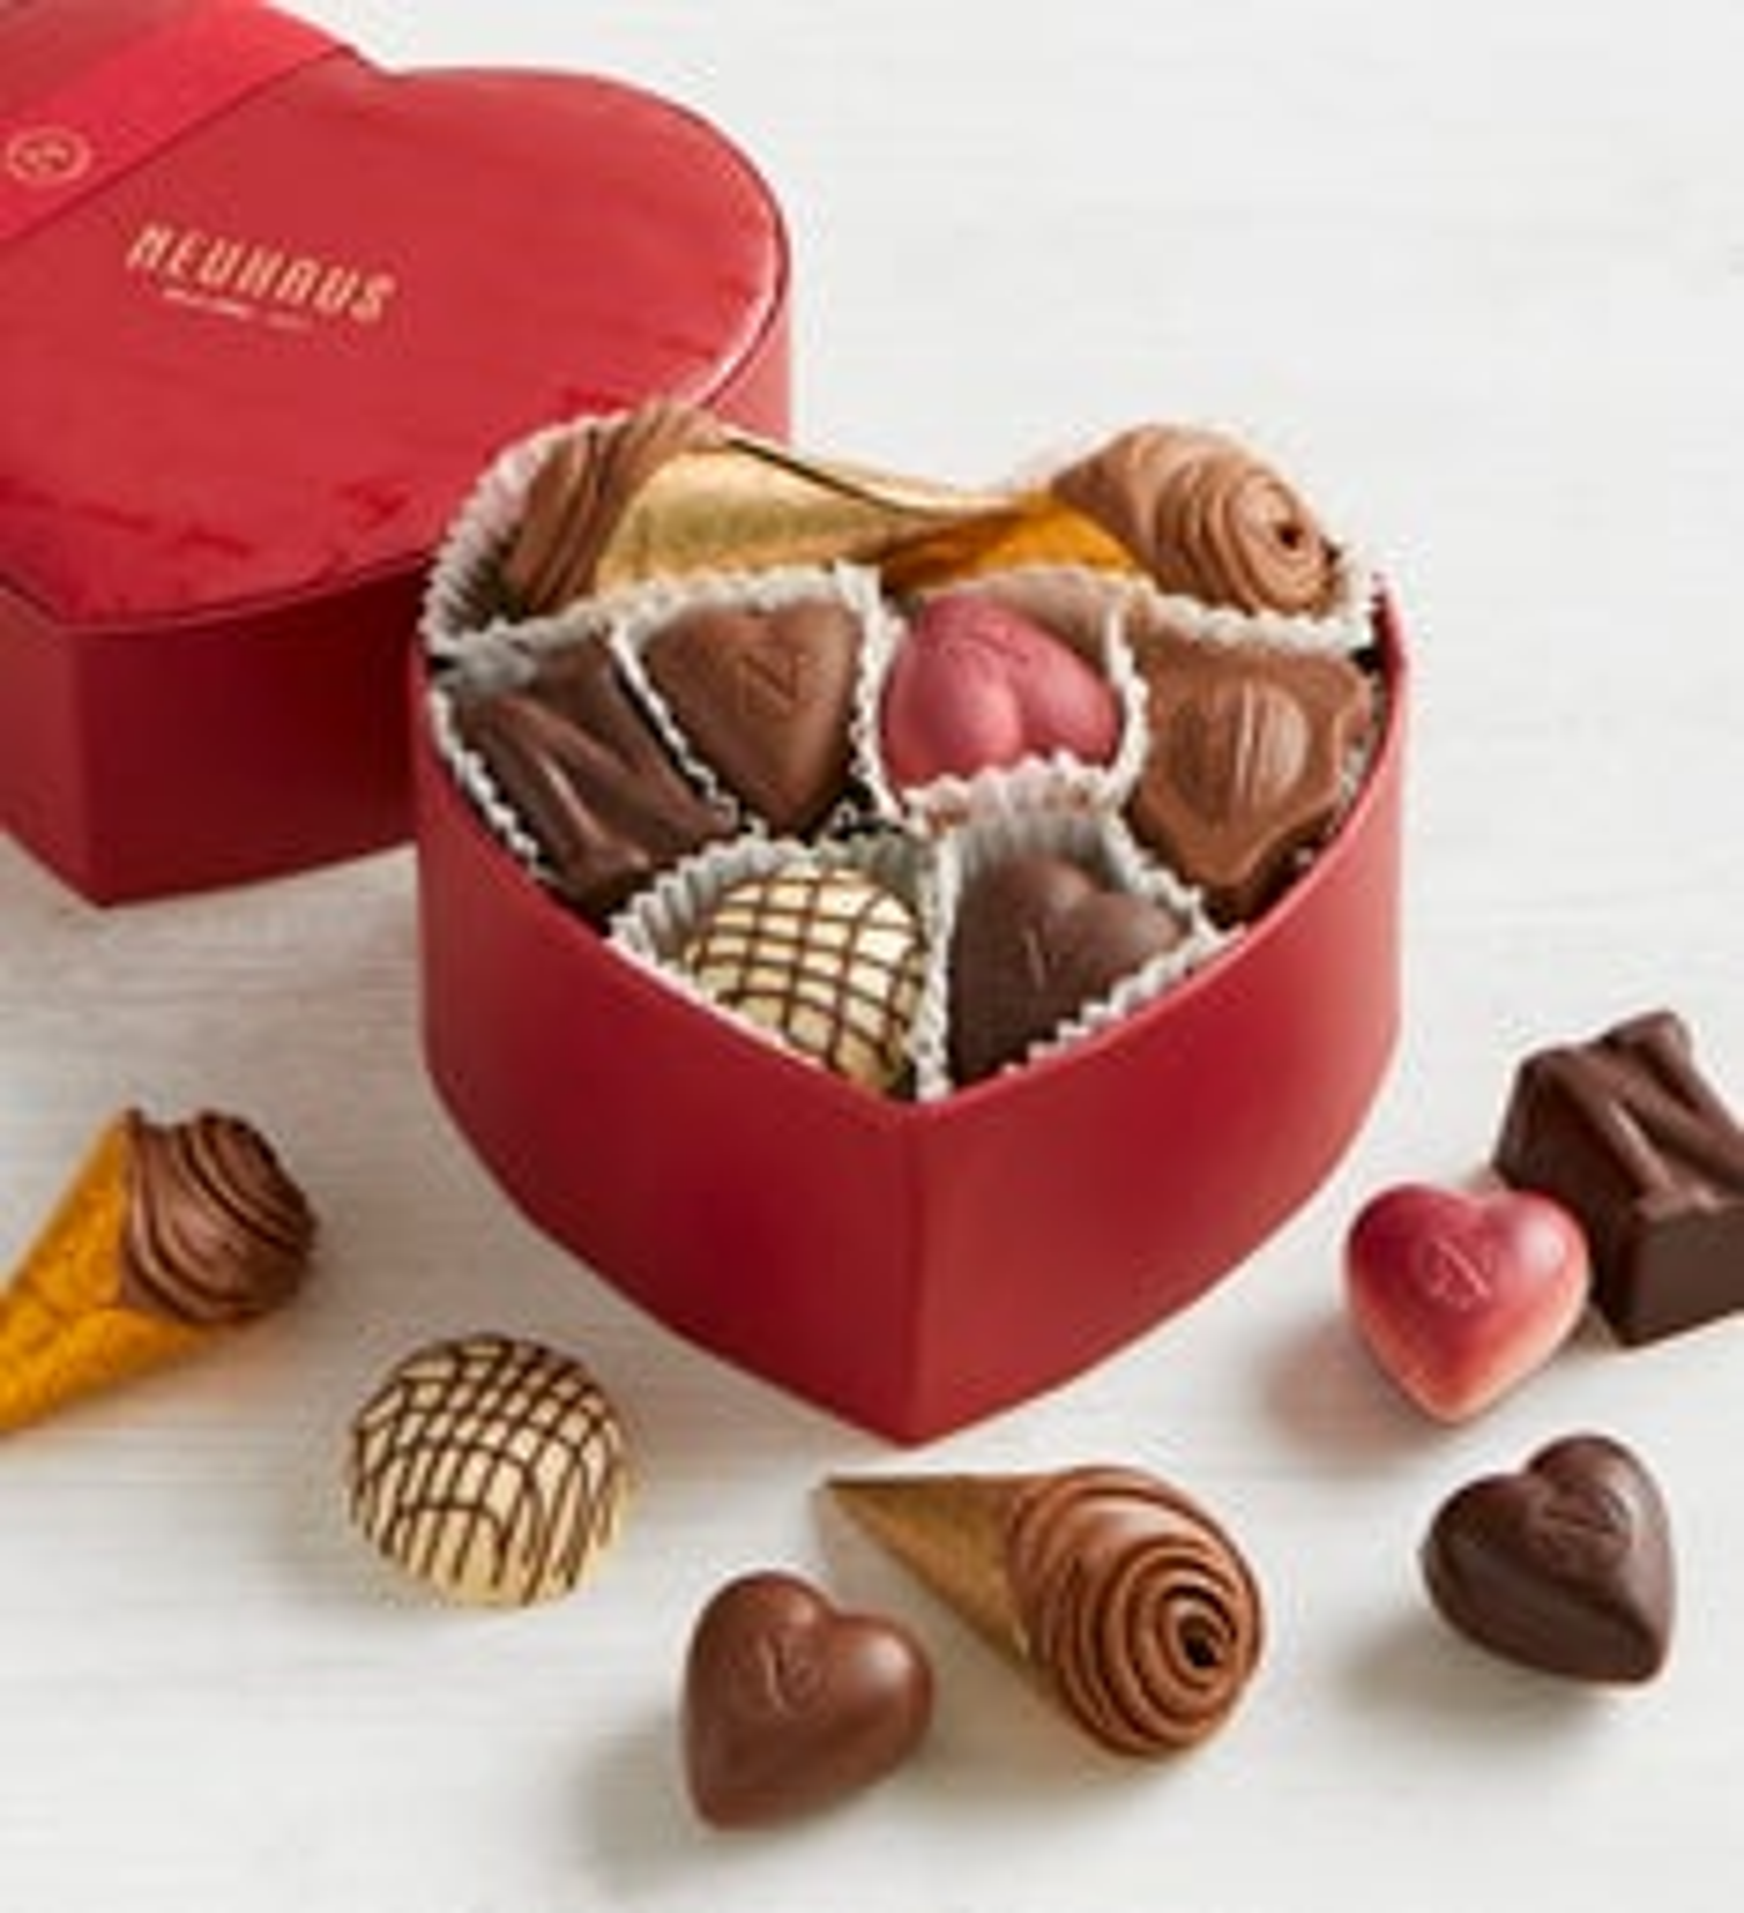 Neuhaus Love Always pc Heart Box